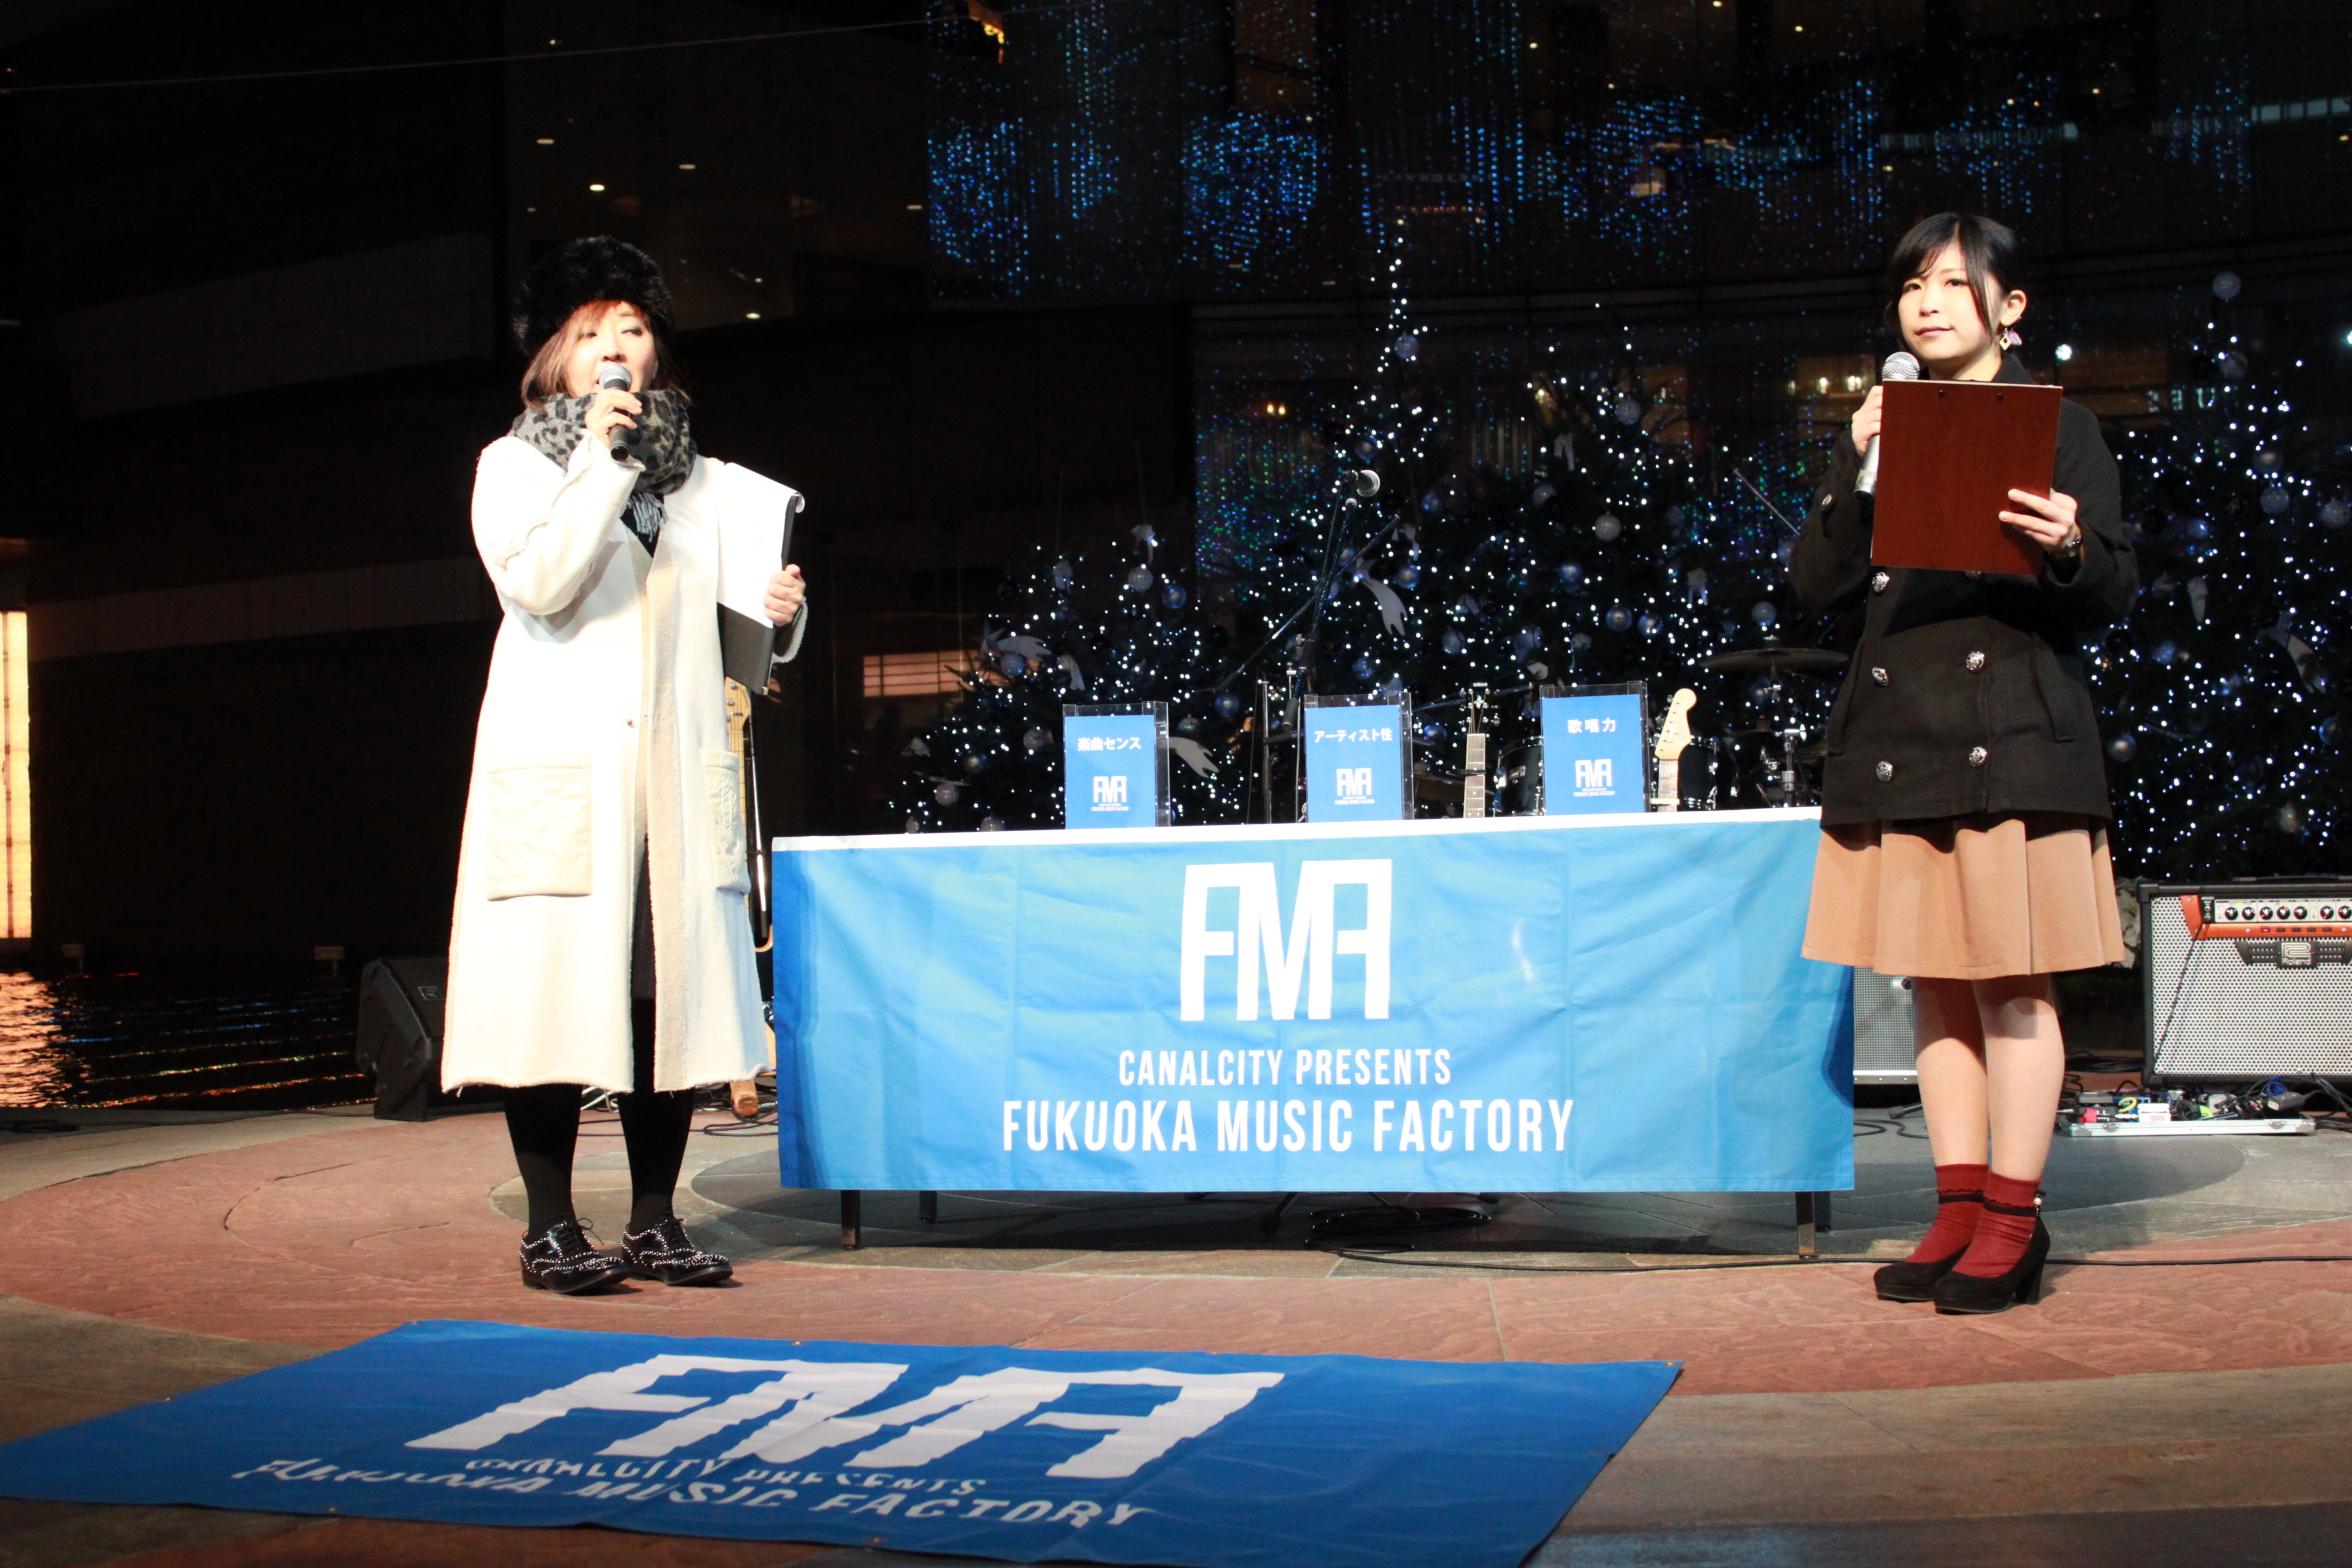 FUKUOKA MUSIC FACTORY 2015 FINAL 開催の様子